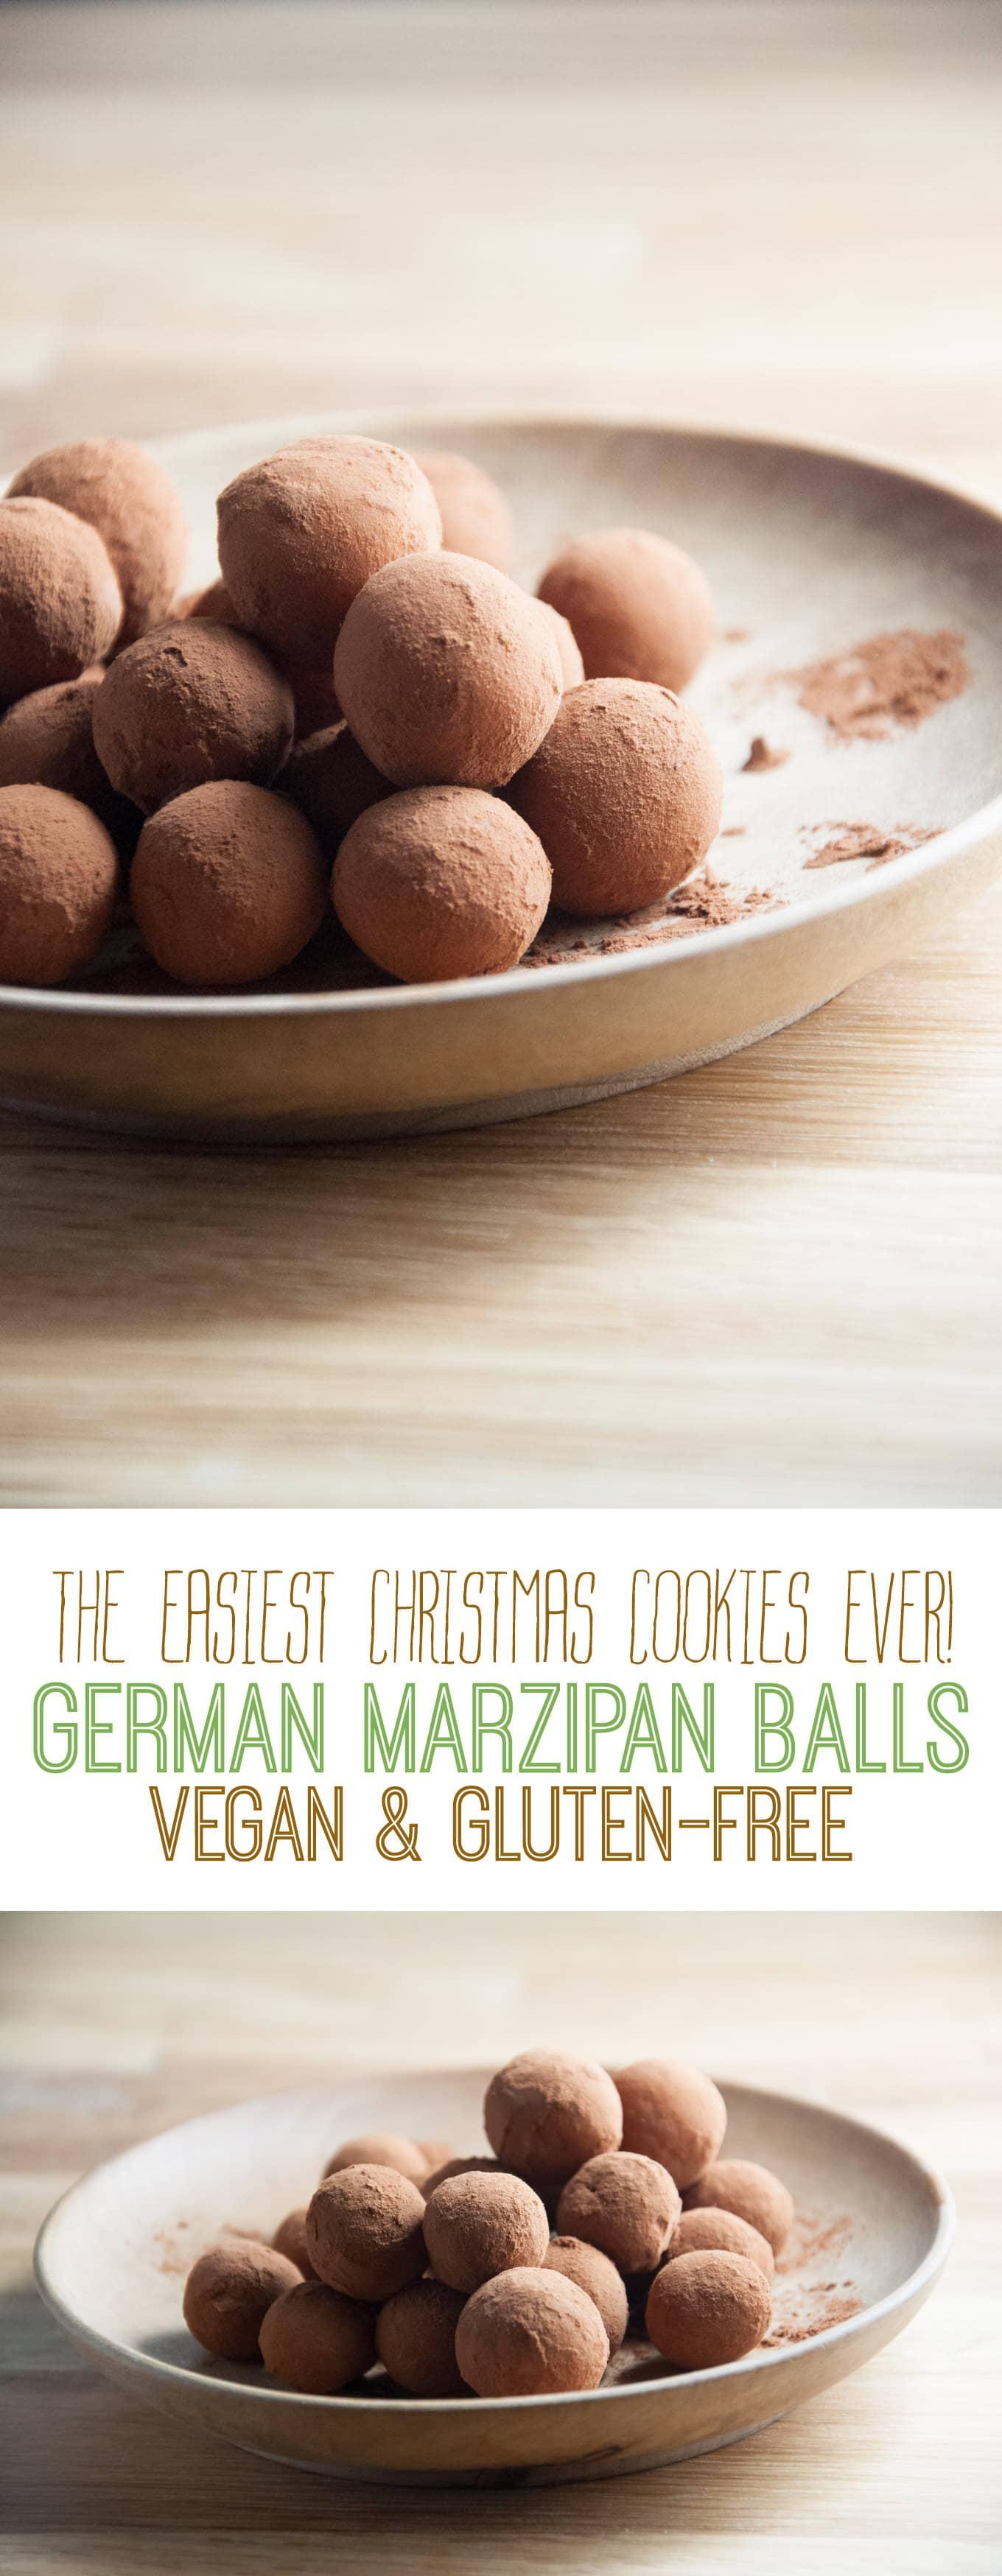 German Marzipan Balls | ElephantasticVegan.com